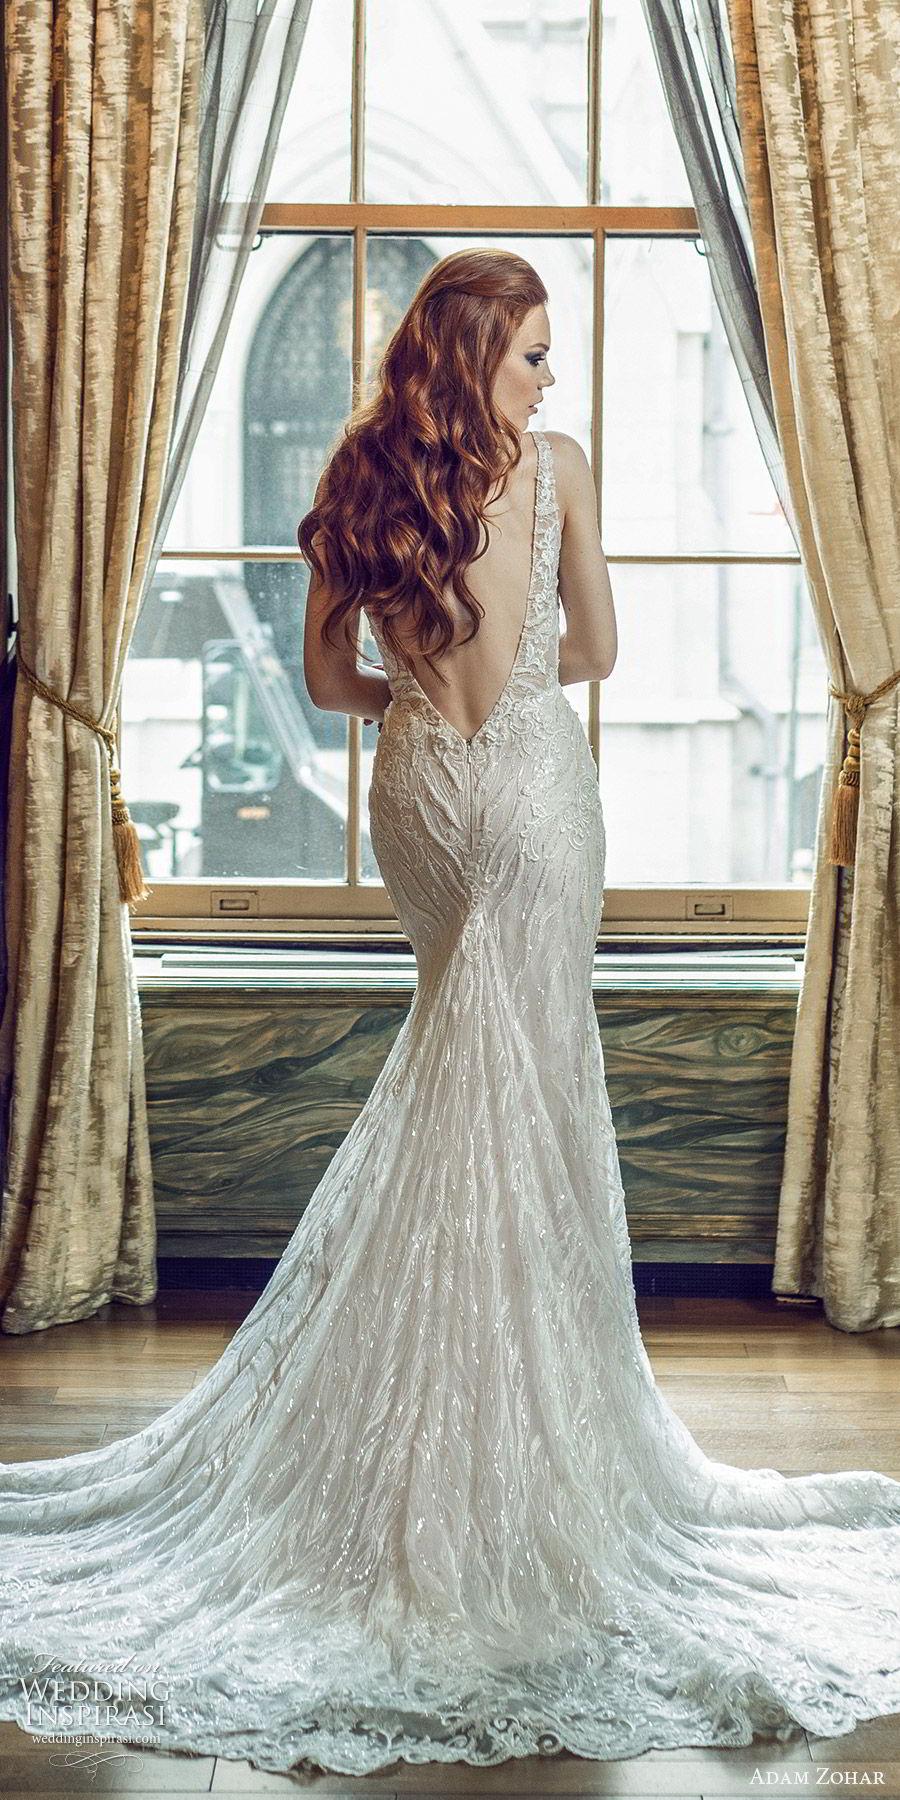 adam zohar 2020 bridal sleeveless deep v neckline fully embellished mermaid fit flare sheath wedding dress (6) elegant glam chapel train bv